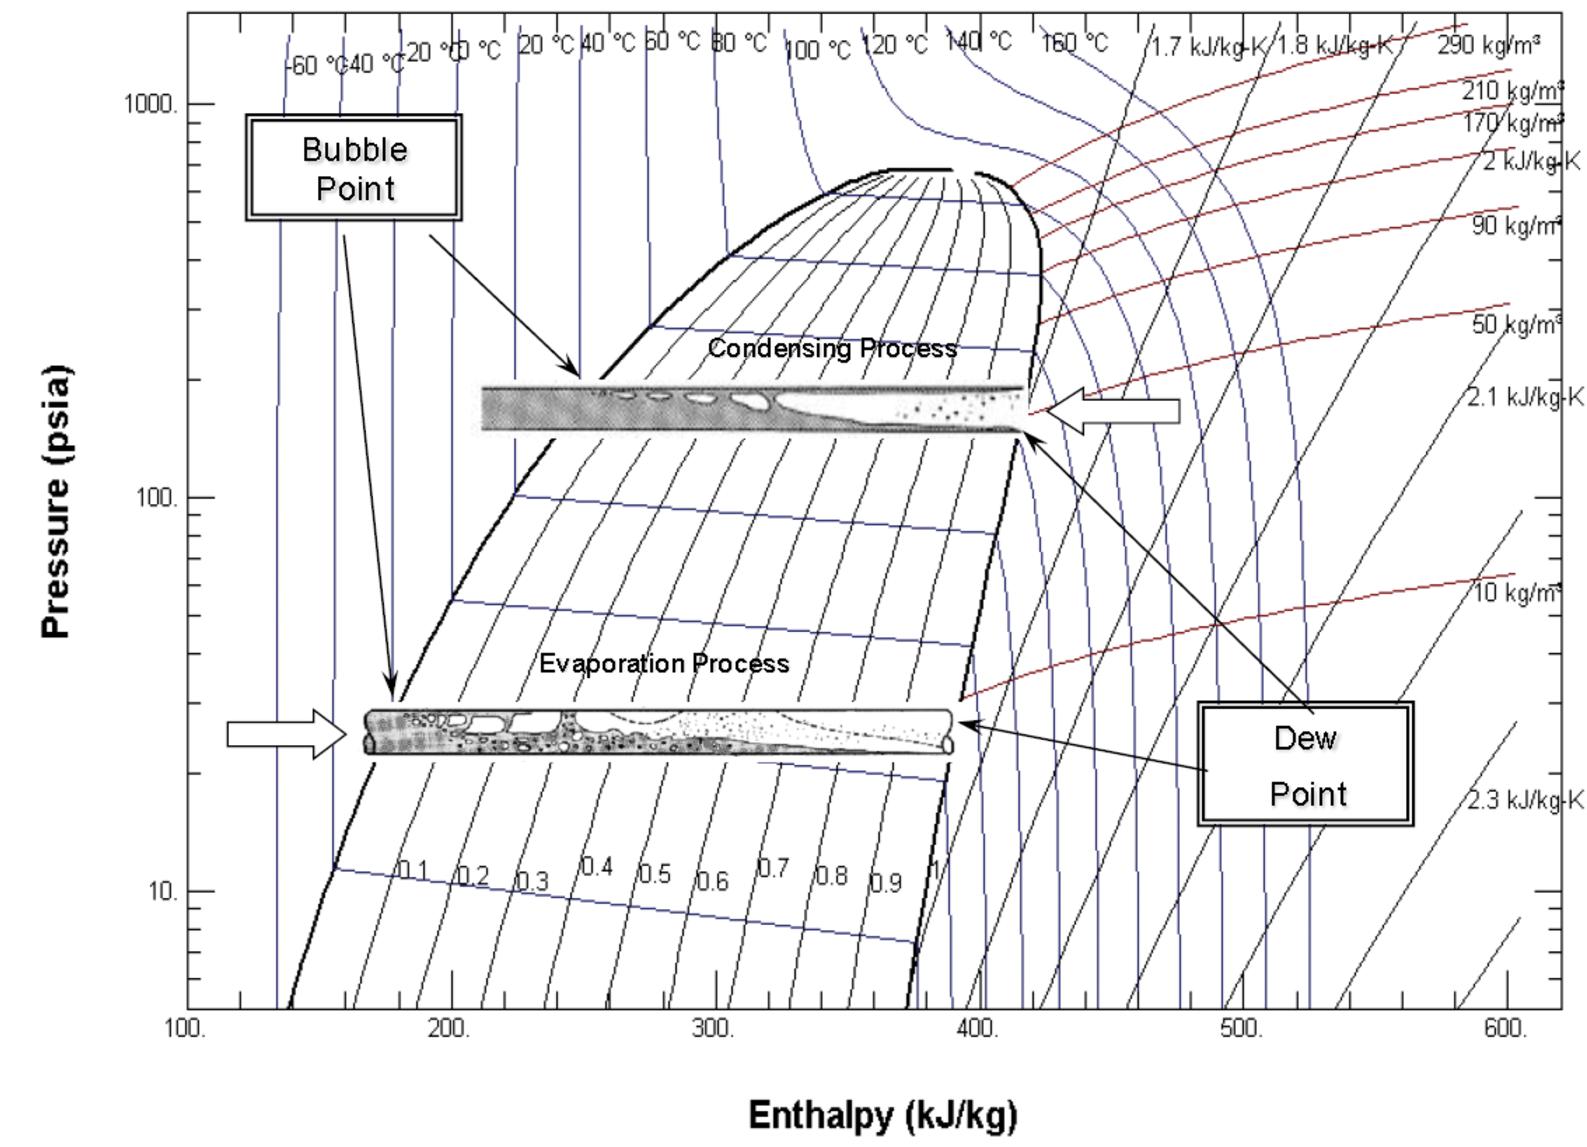 figure 2 mollier diagram pressure enthalpy chart single refrigerant courtesy honeywell [ 1587 x 1147 Pixel ]